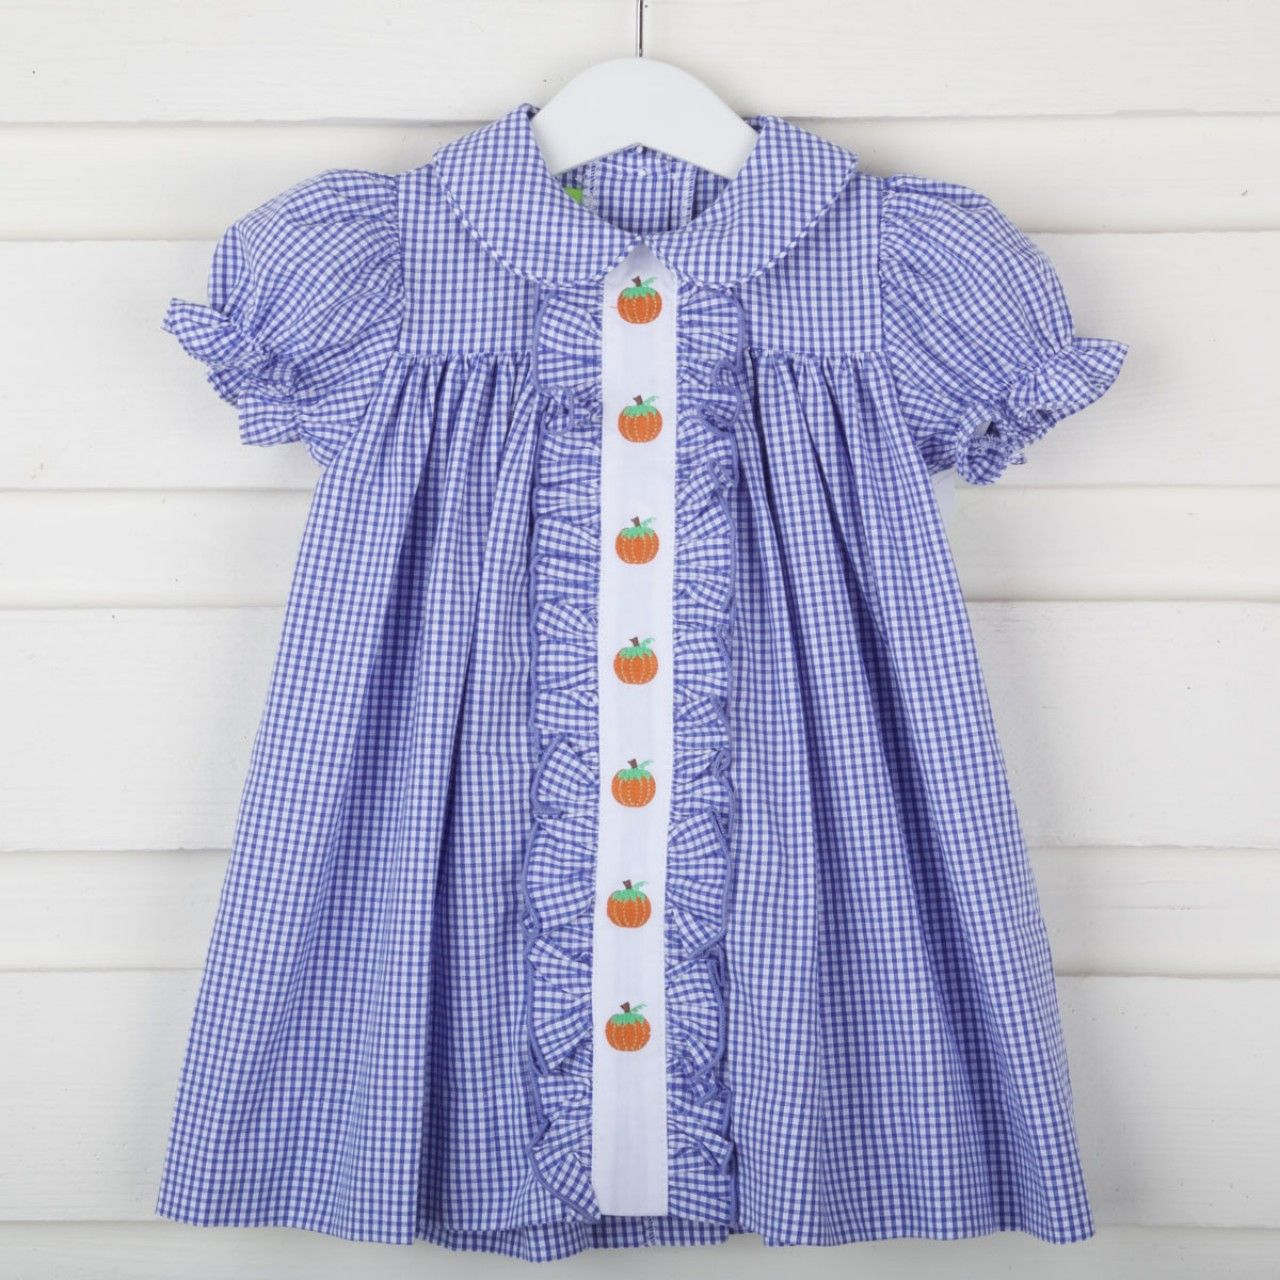 Pumpkin Center Embroidered Dress Royal Blue Gingham